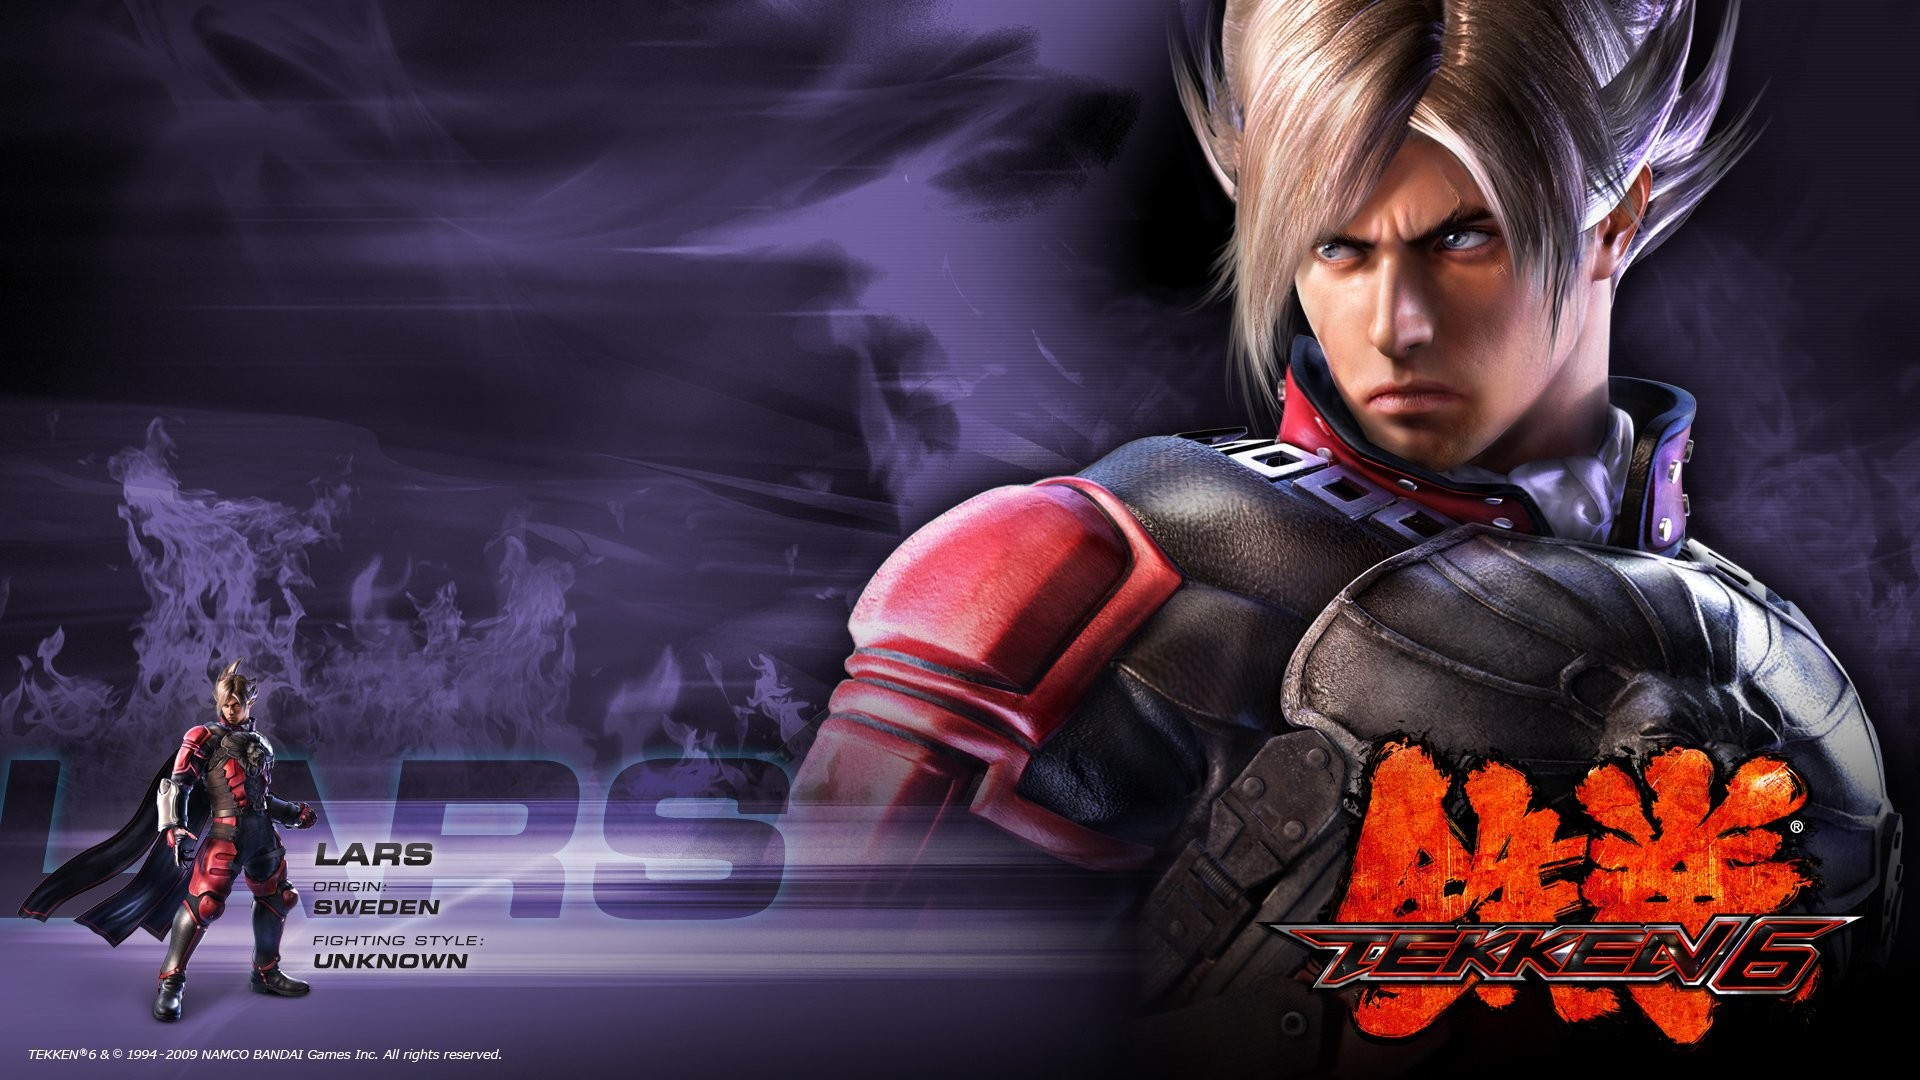 Jin Kazama Hd Wallpaper Tekken 6 Wallpapers 62 Images